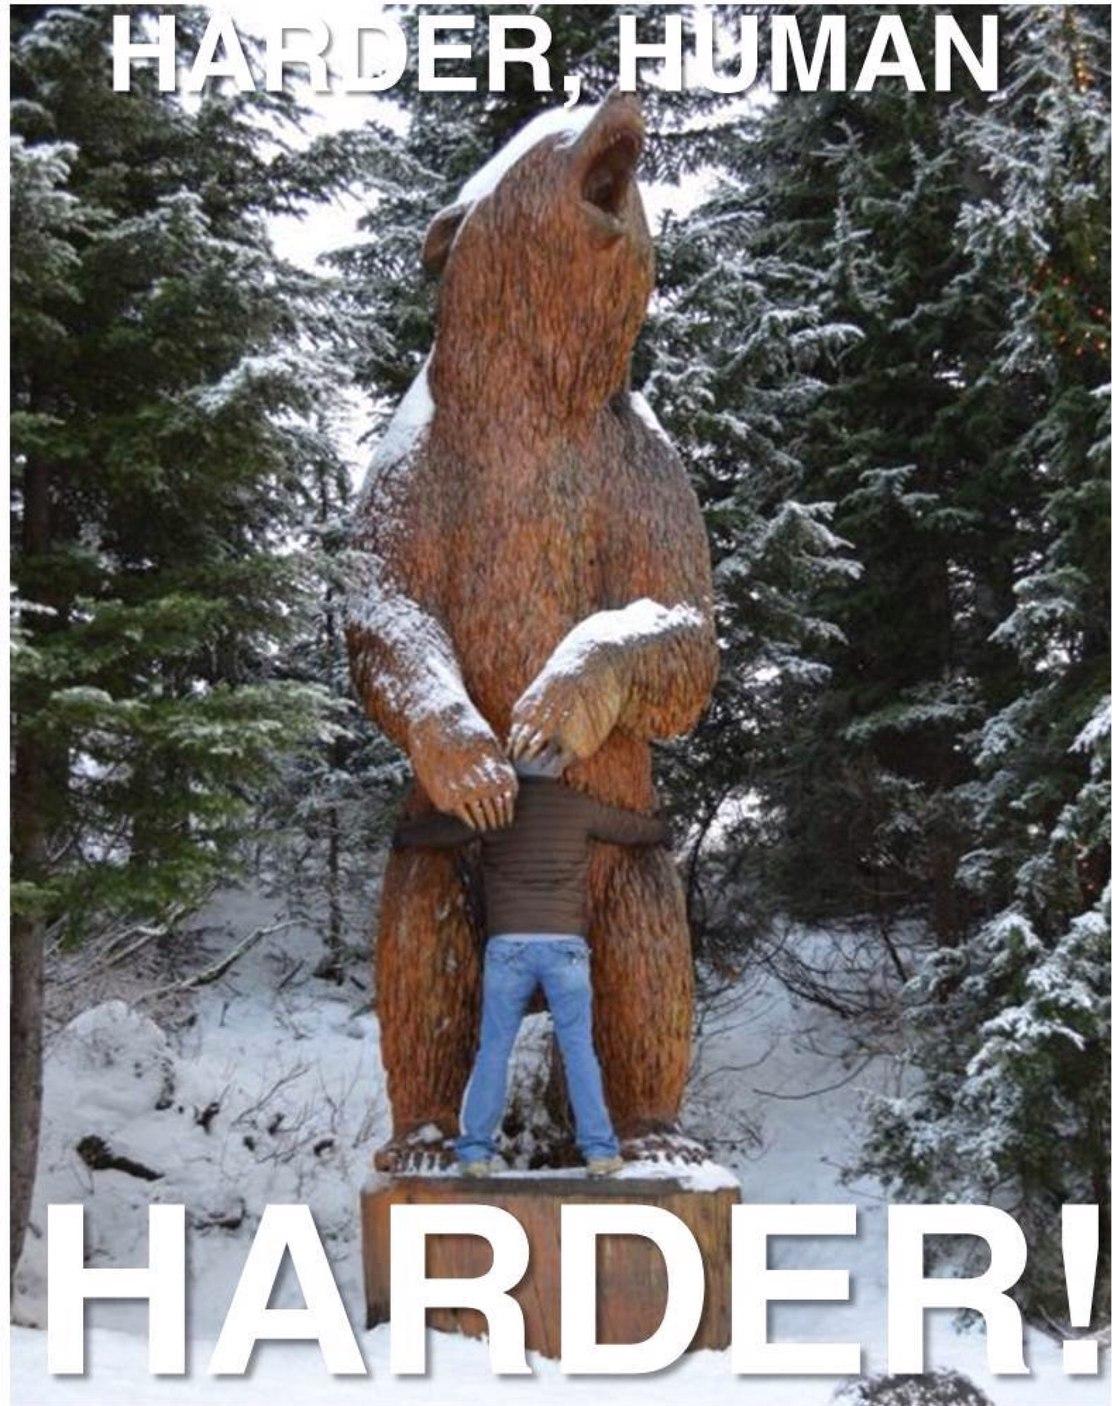 please your bear lord human - meme